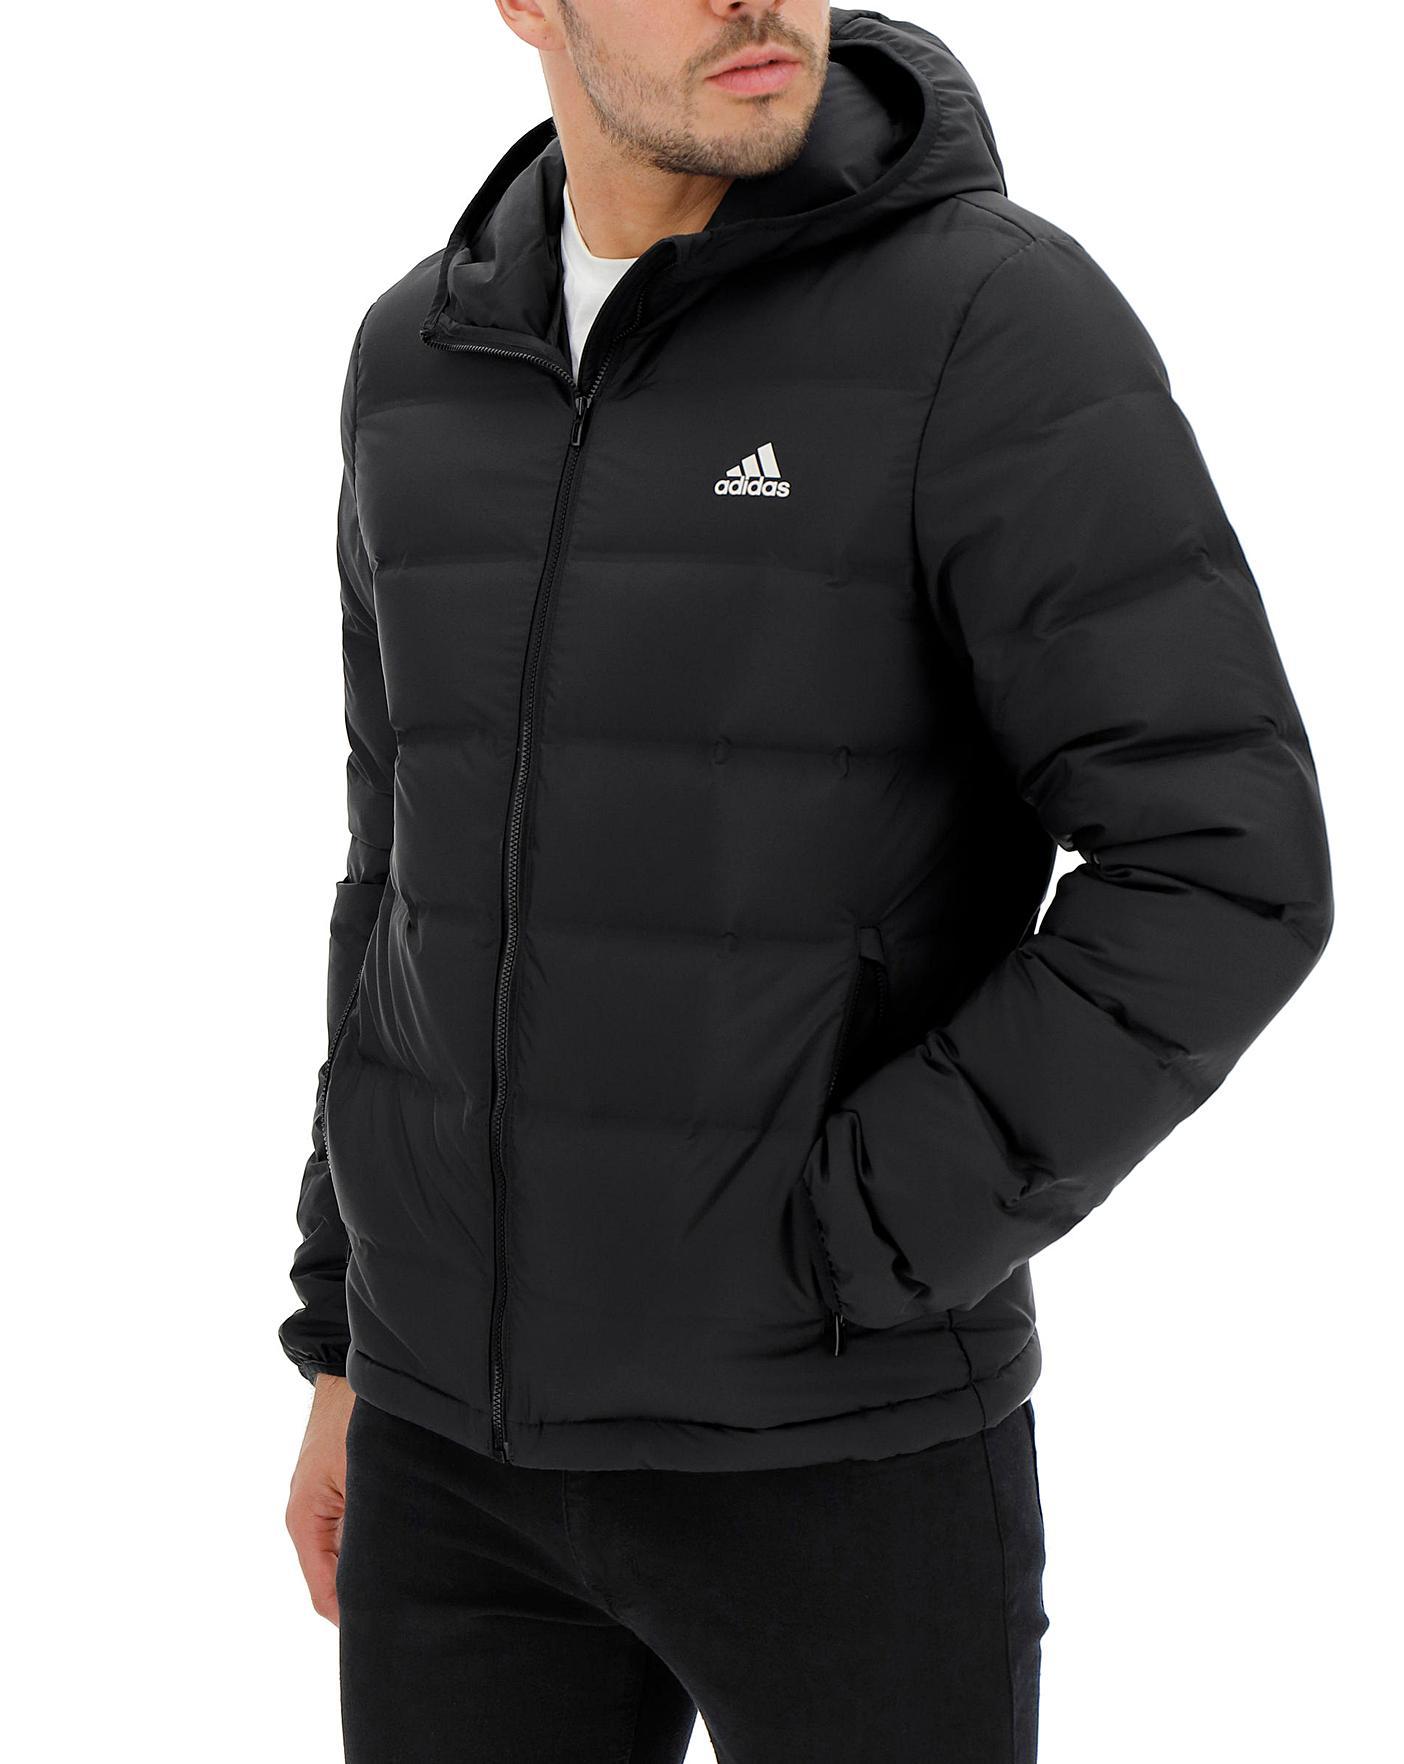 Integrar Leer cuenco  adidas Helionic Hooded Jacket | Jacamo